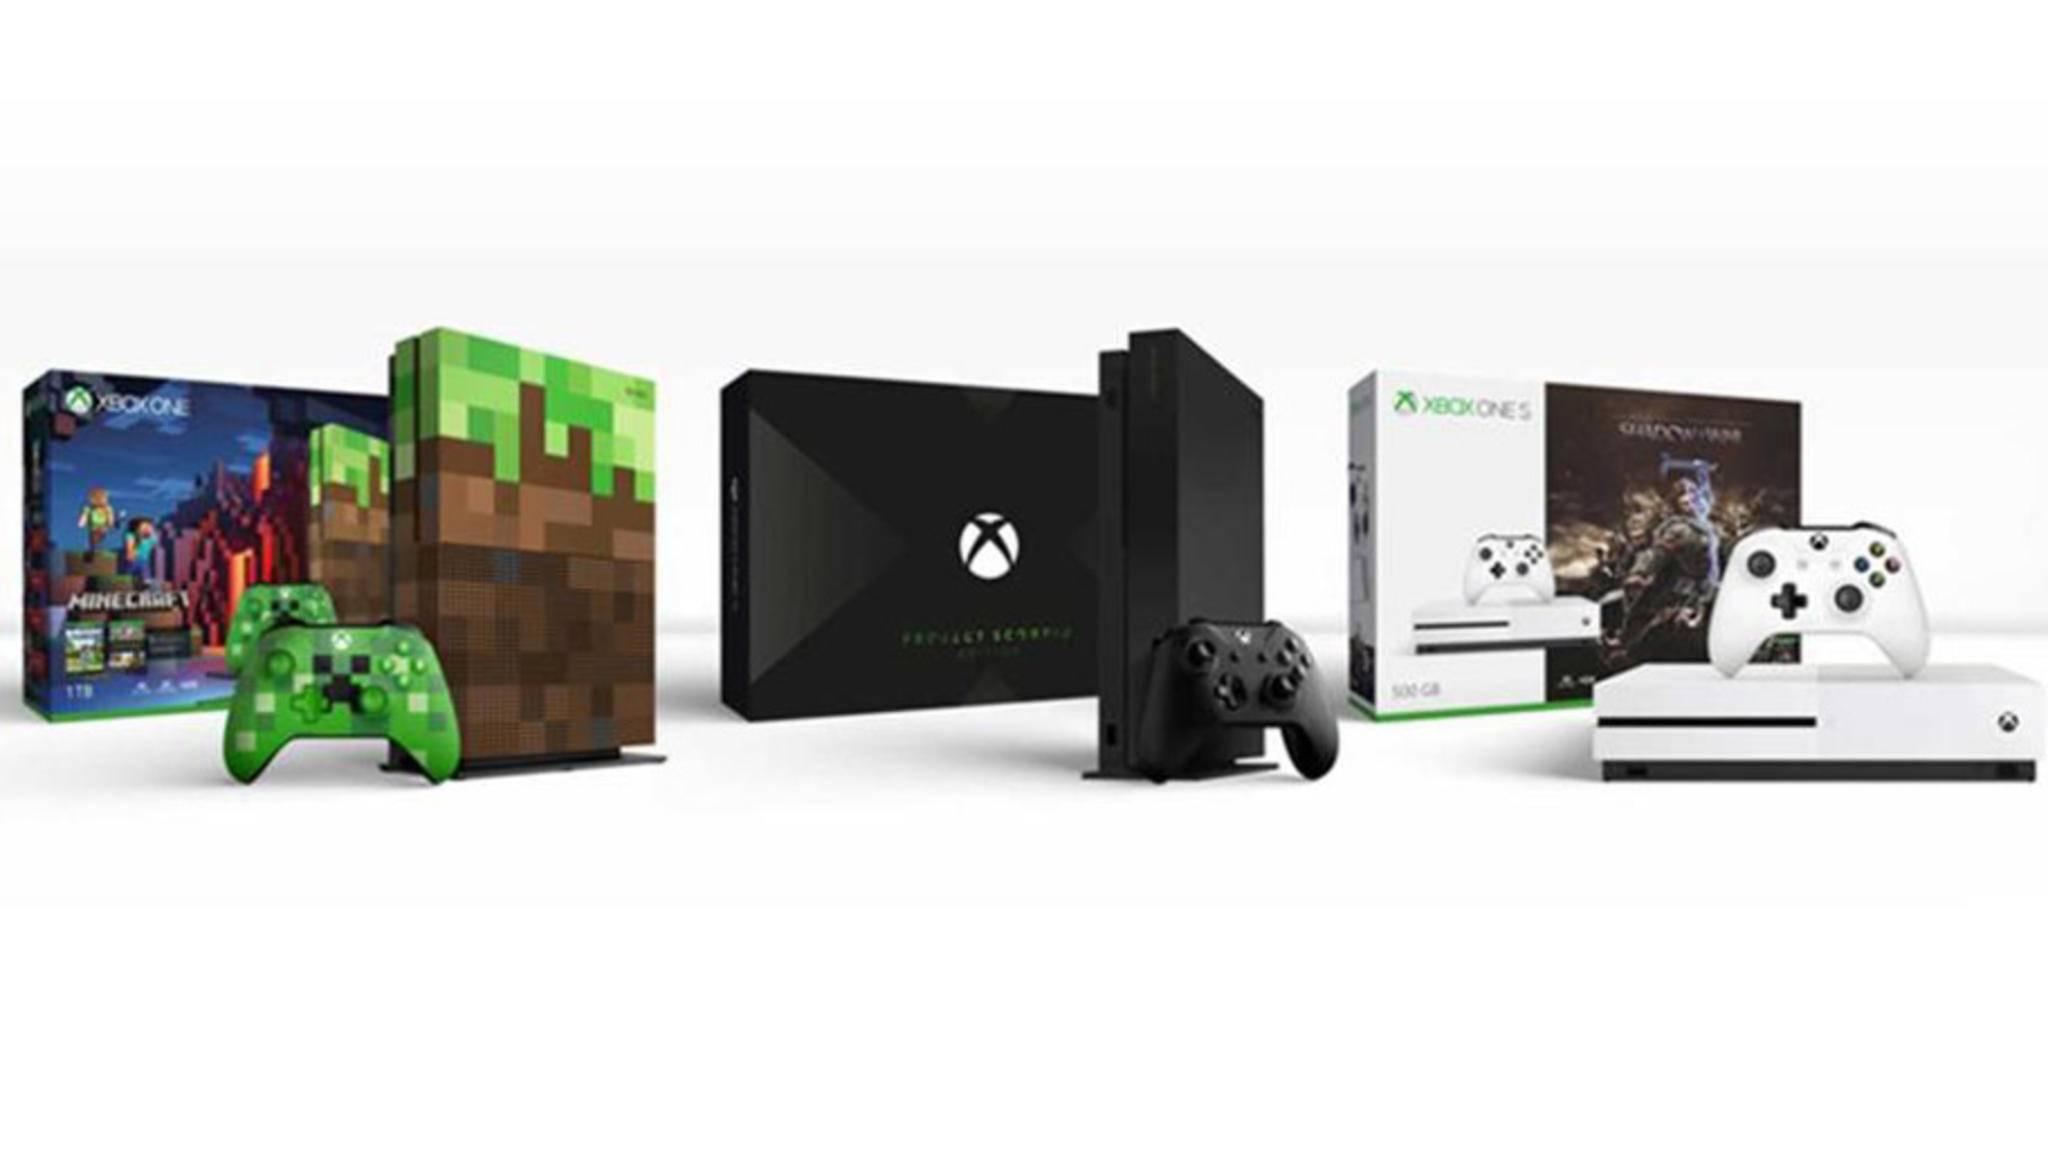 Zur Gamescom 2017 kündigt Microsoft neue Konsolen-Versionen an.